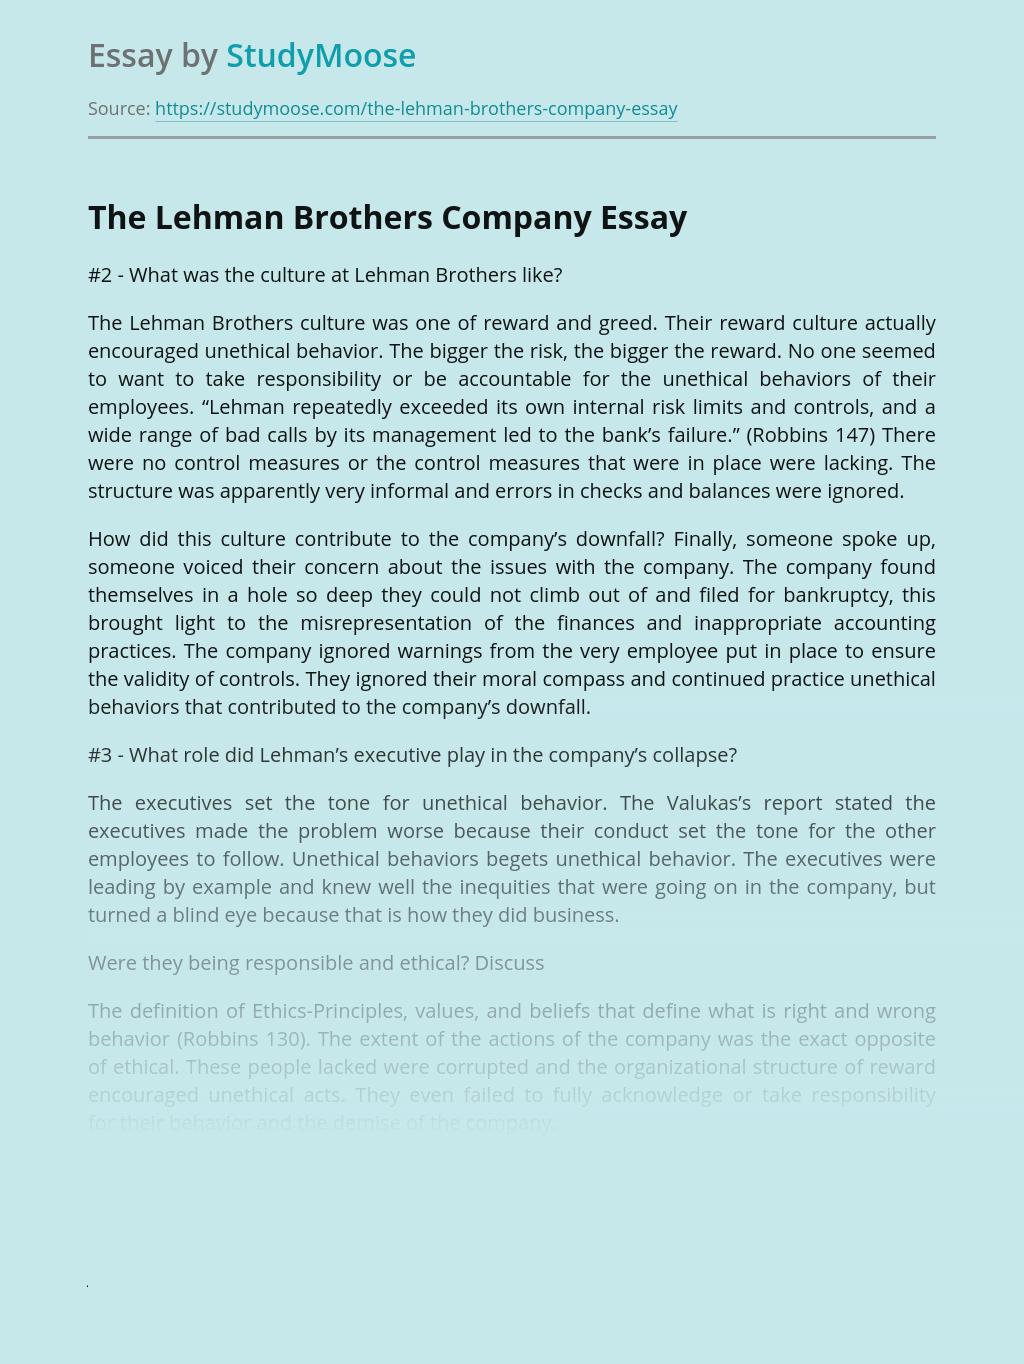 The Lehman Brothers Company